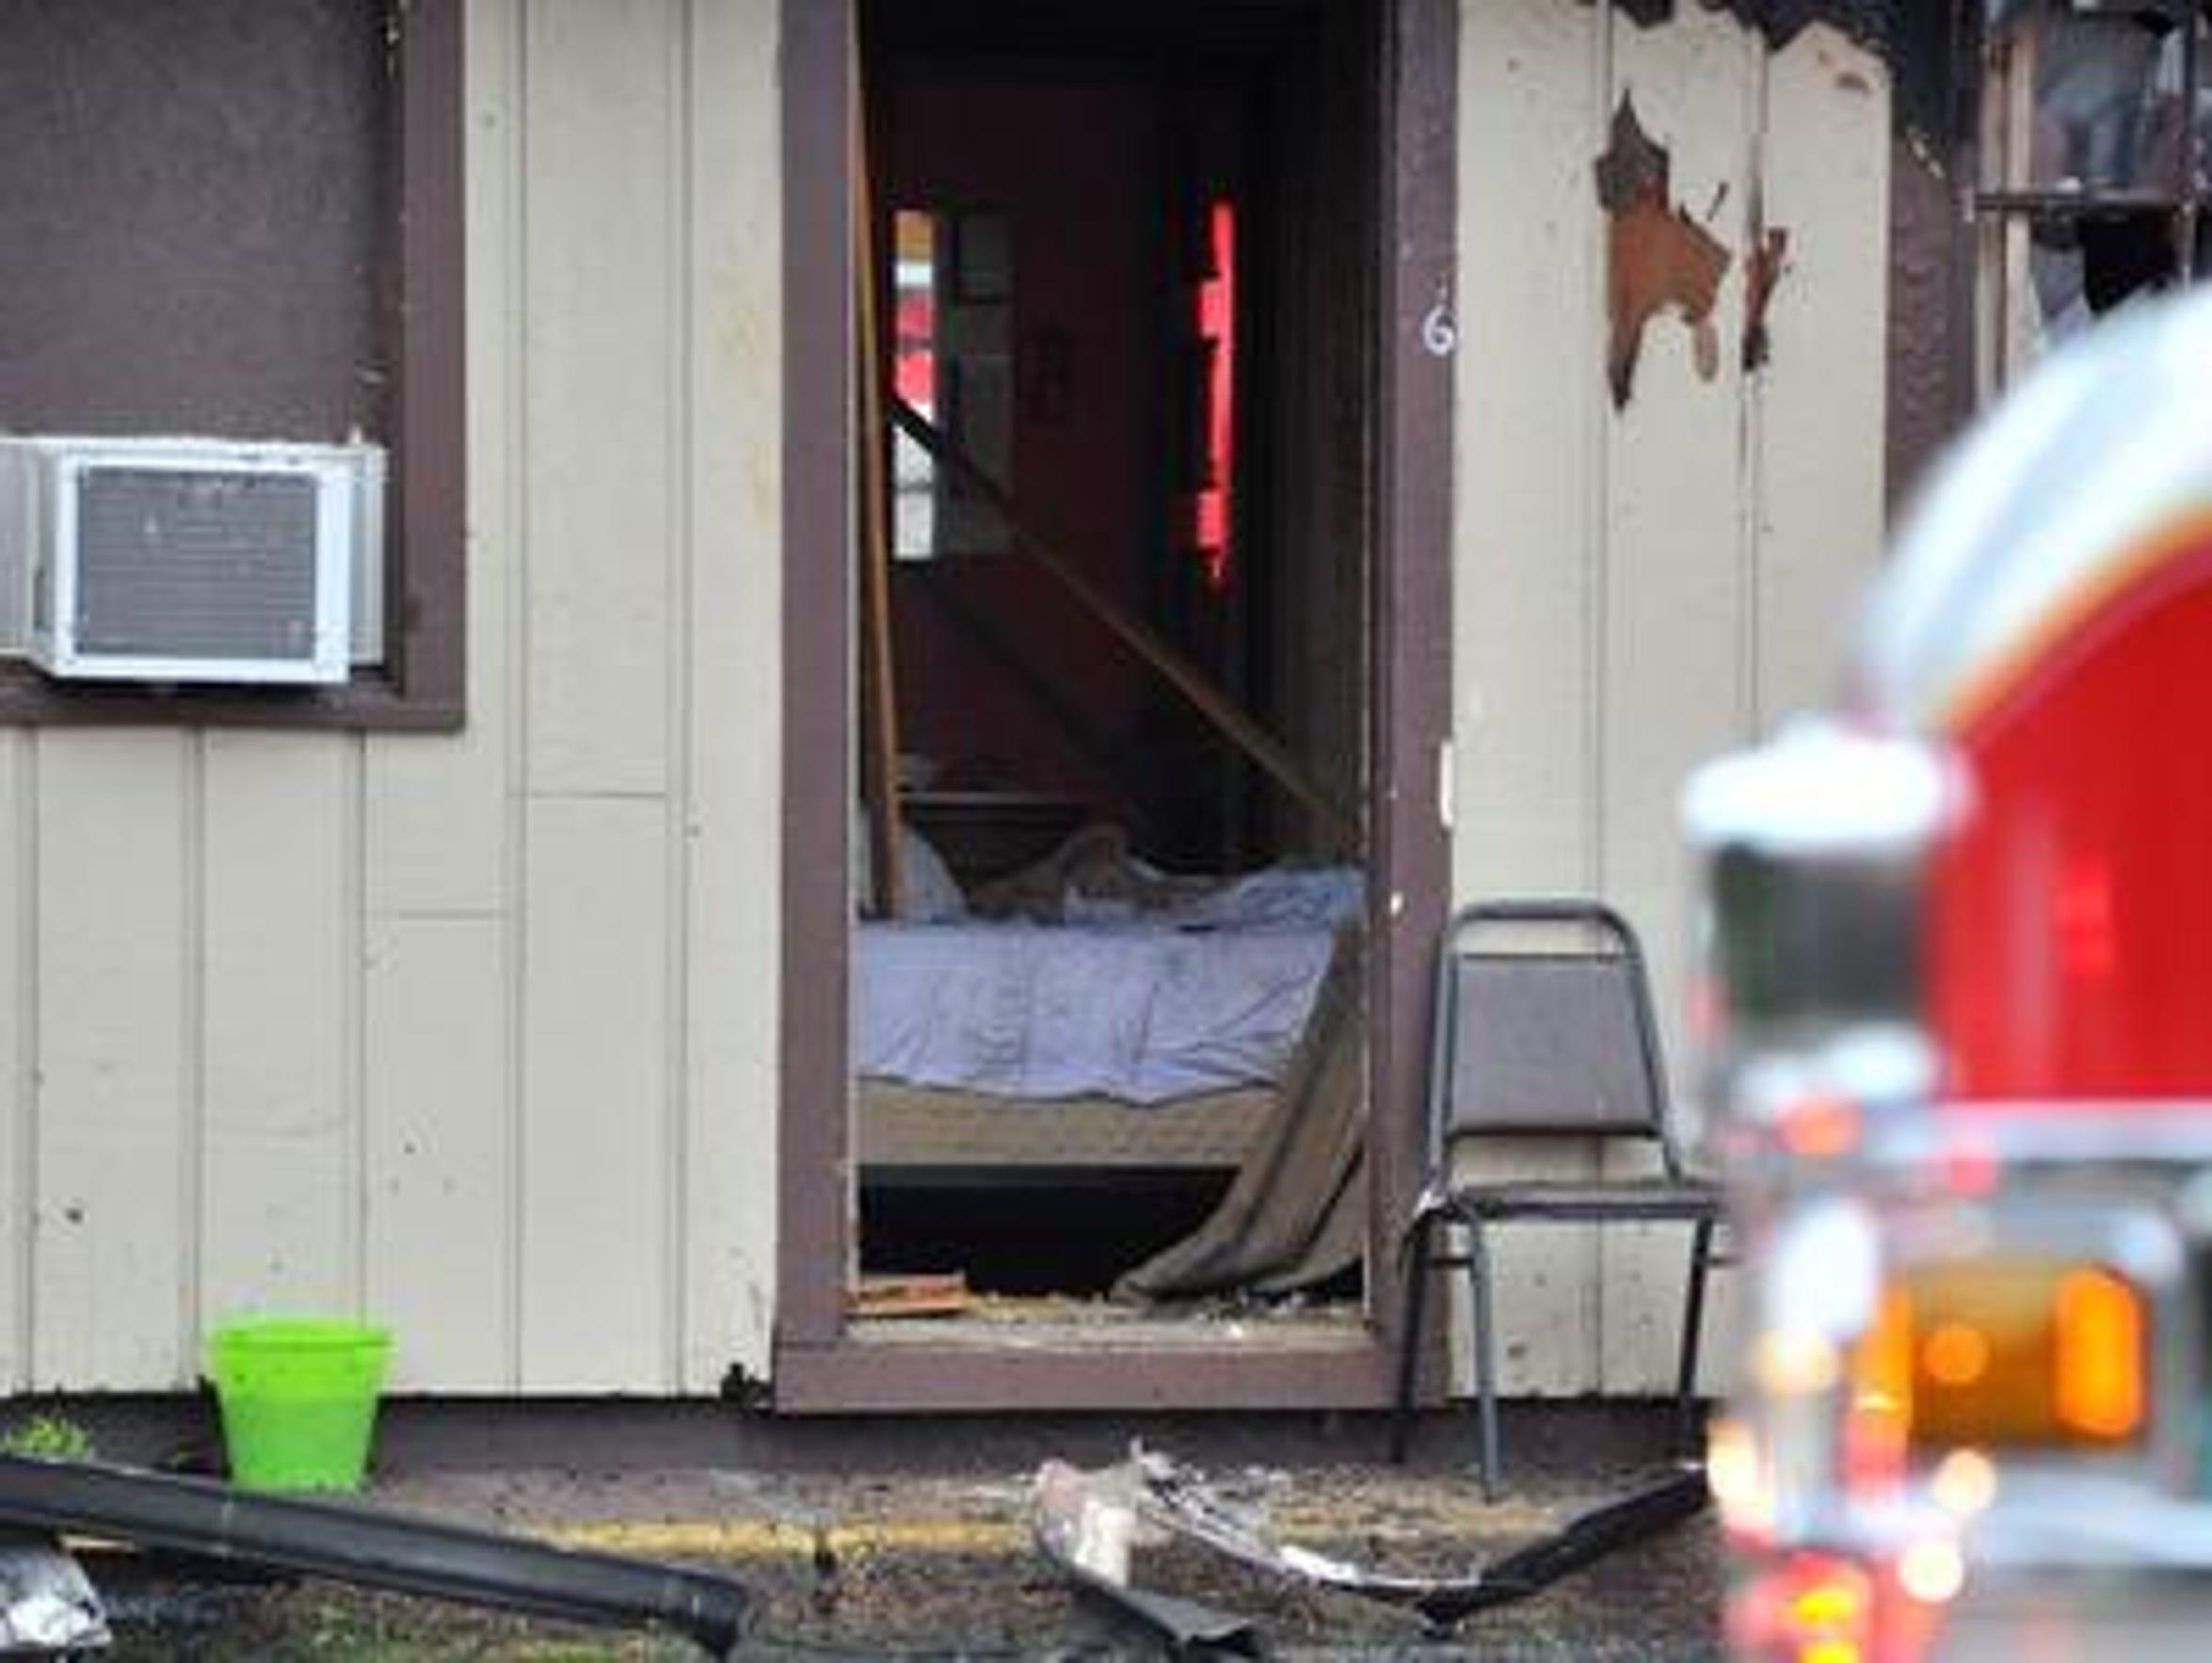 Twenty-seven people lived in the Ponderosa Motel. Many